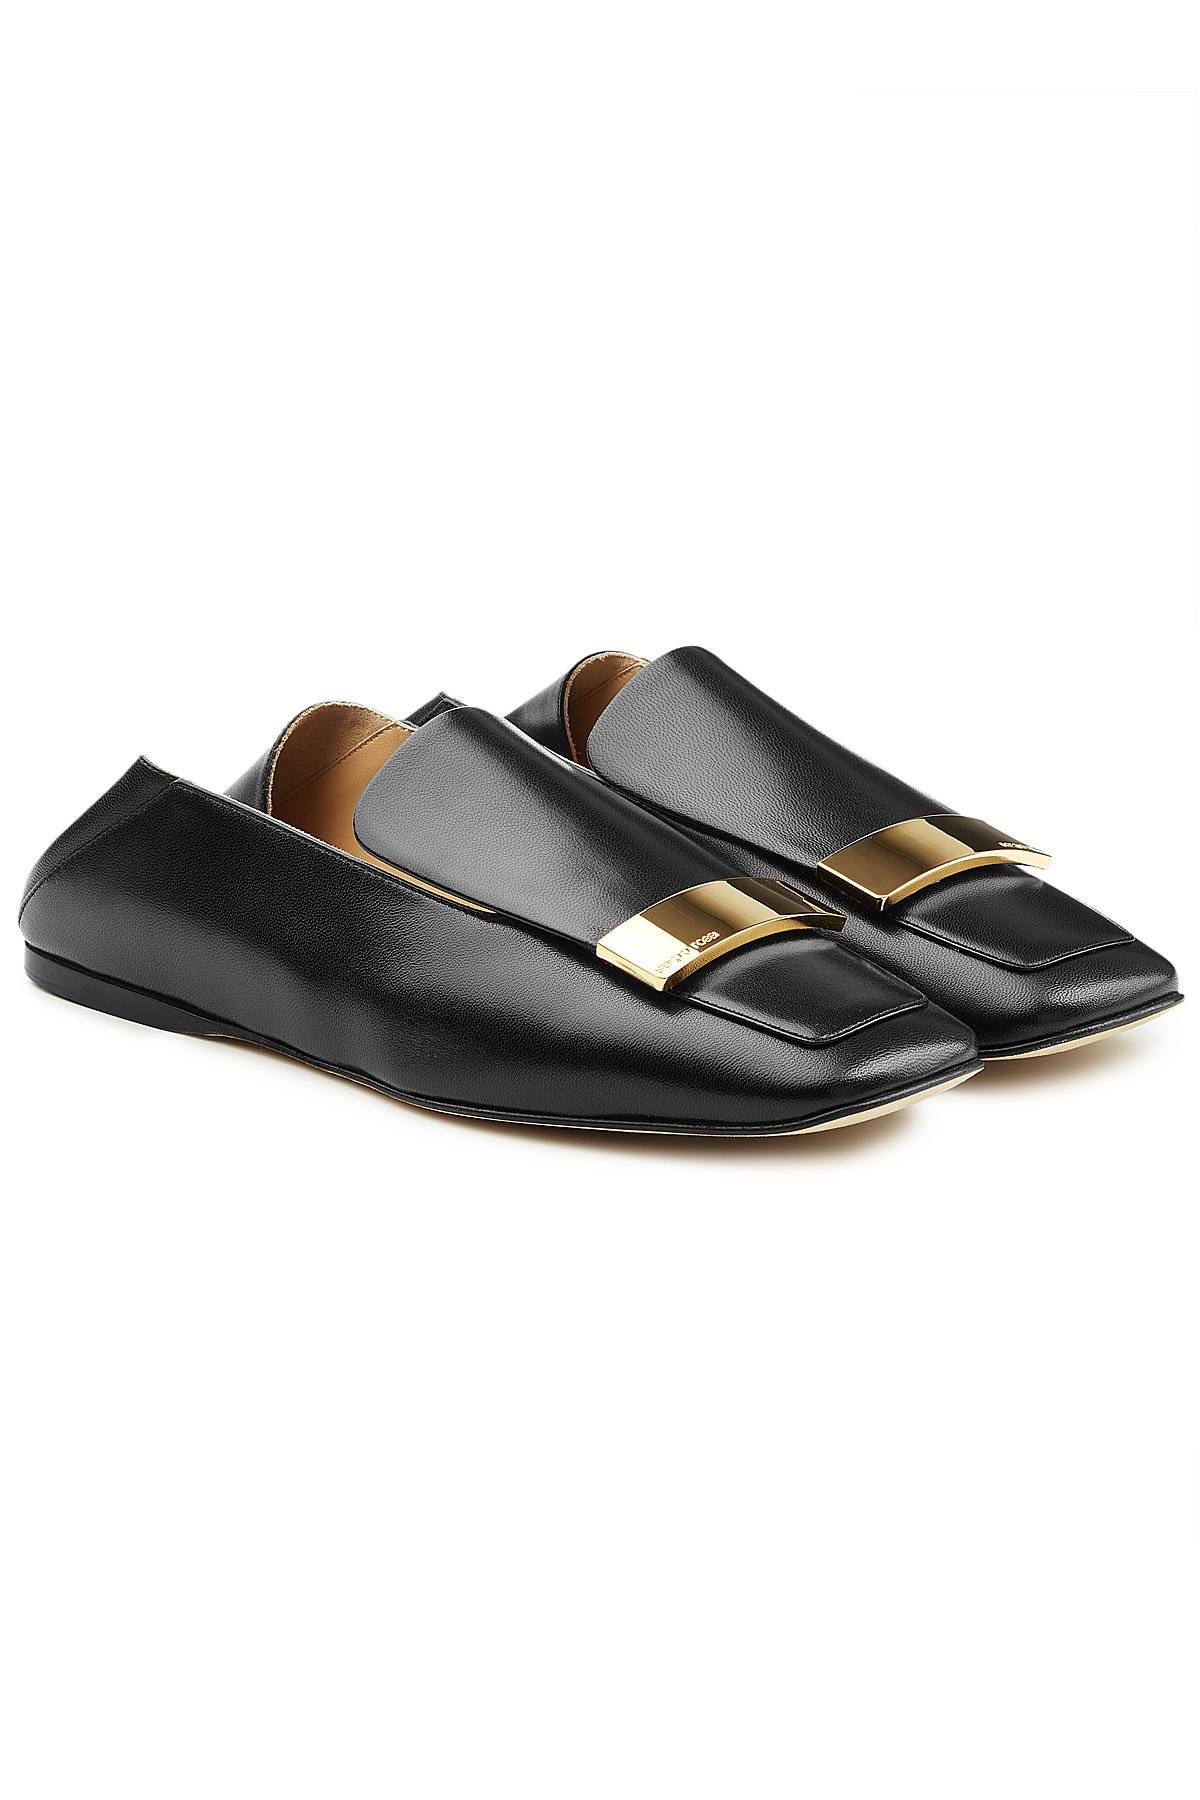 Jil Sander Leather Shoes with Triple Monk Straps Gr. IT 37 IHan1M